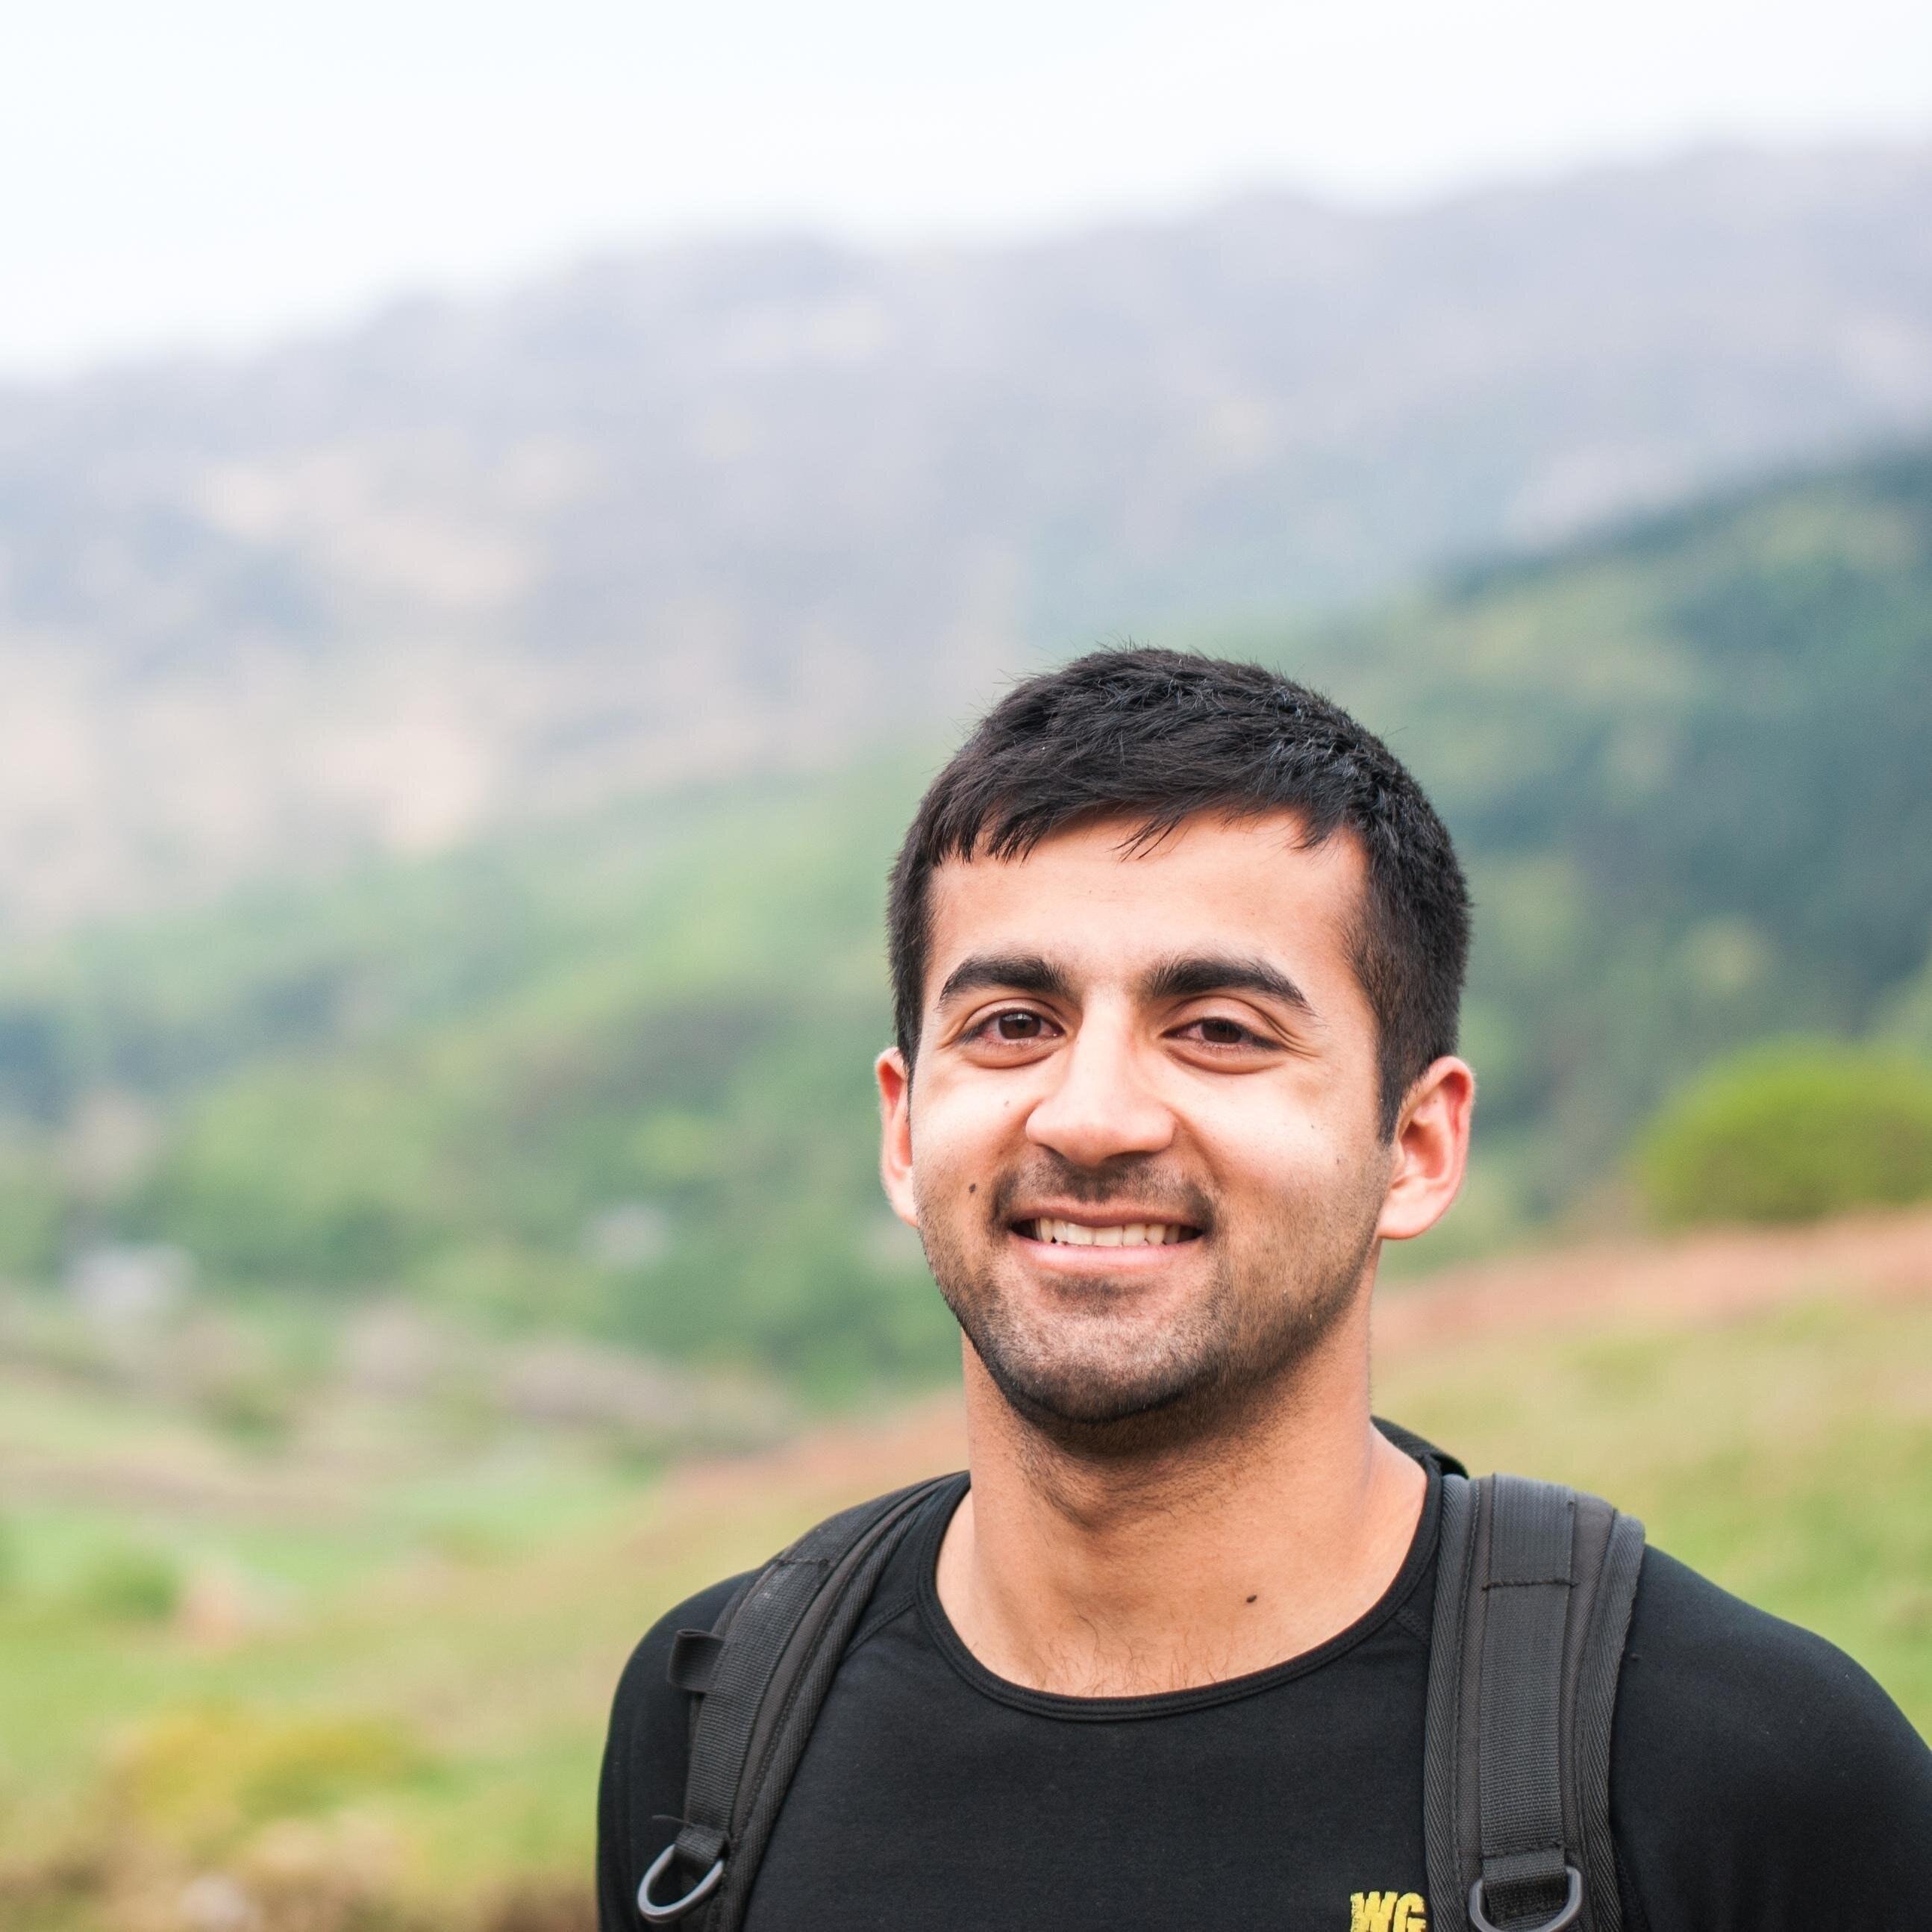 Fahim Sachedina